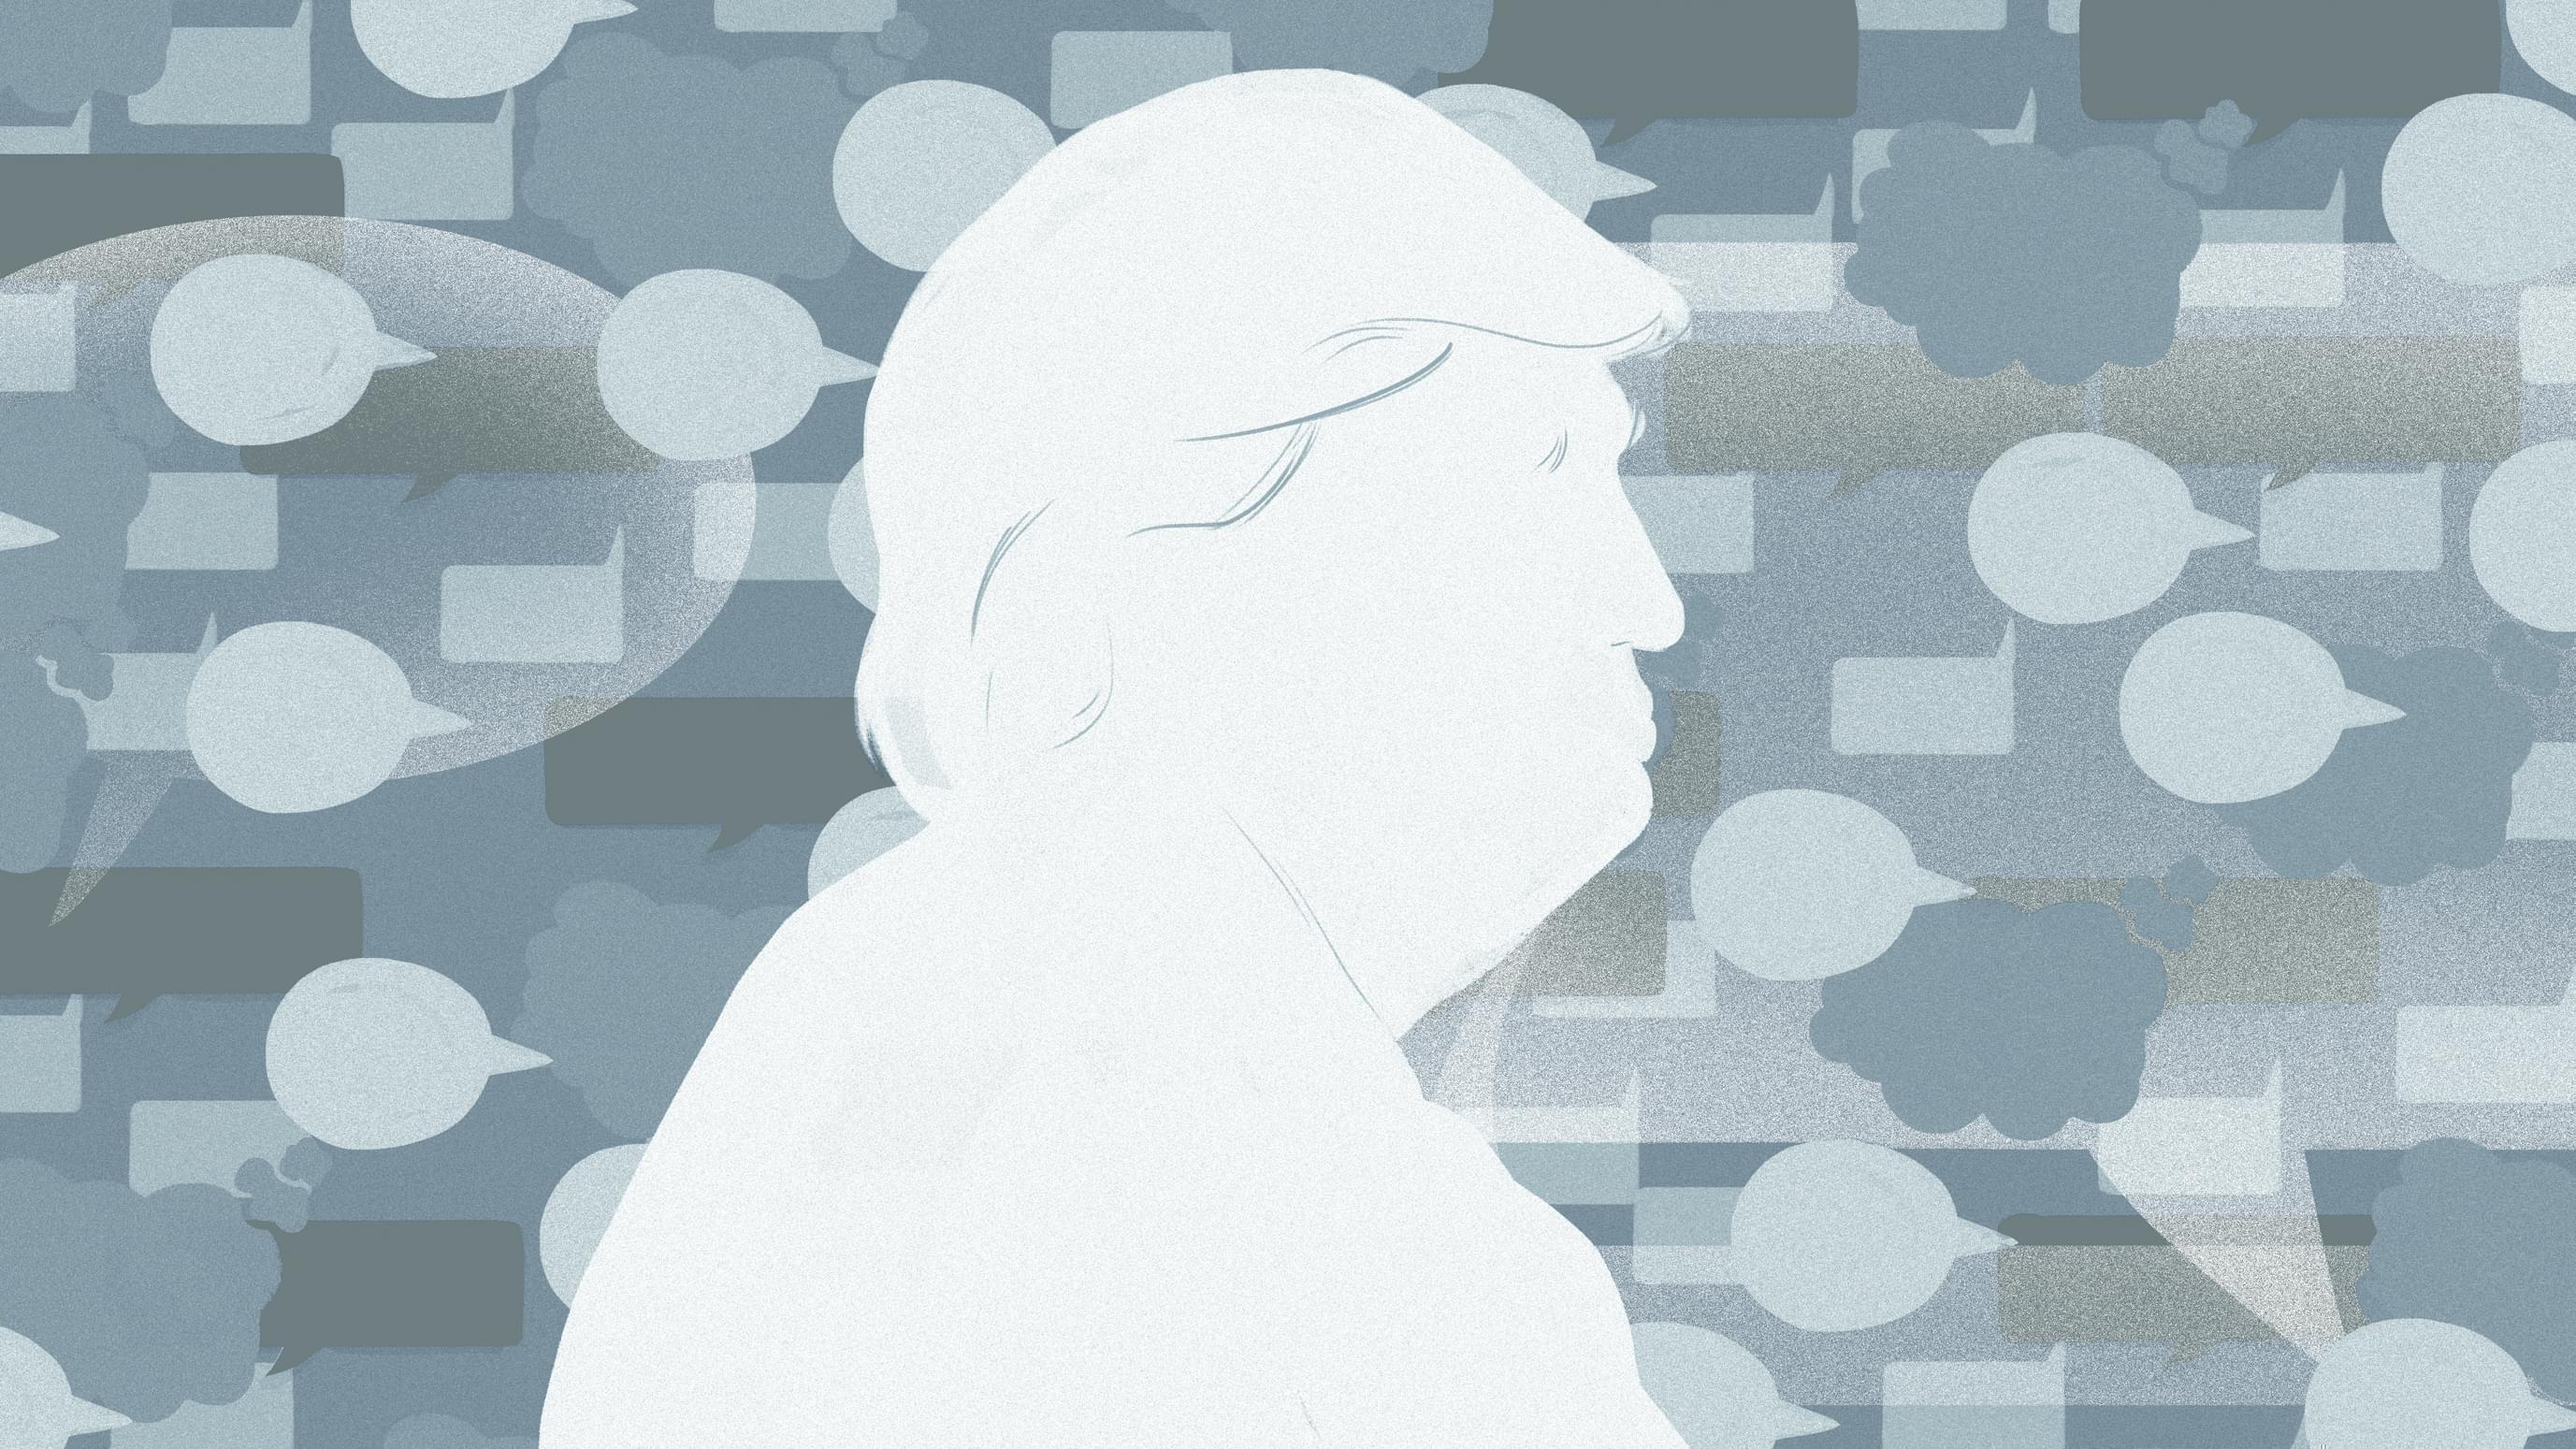 Illustration of President Donald Trump